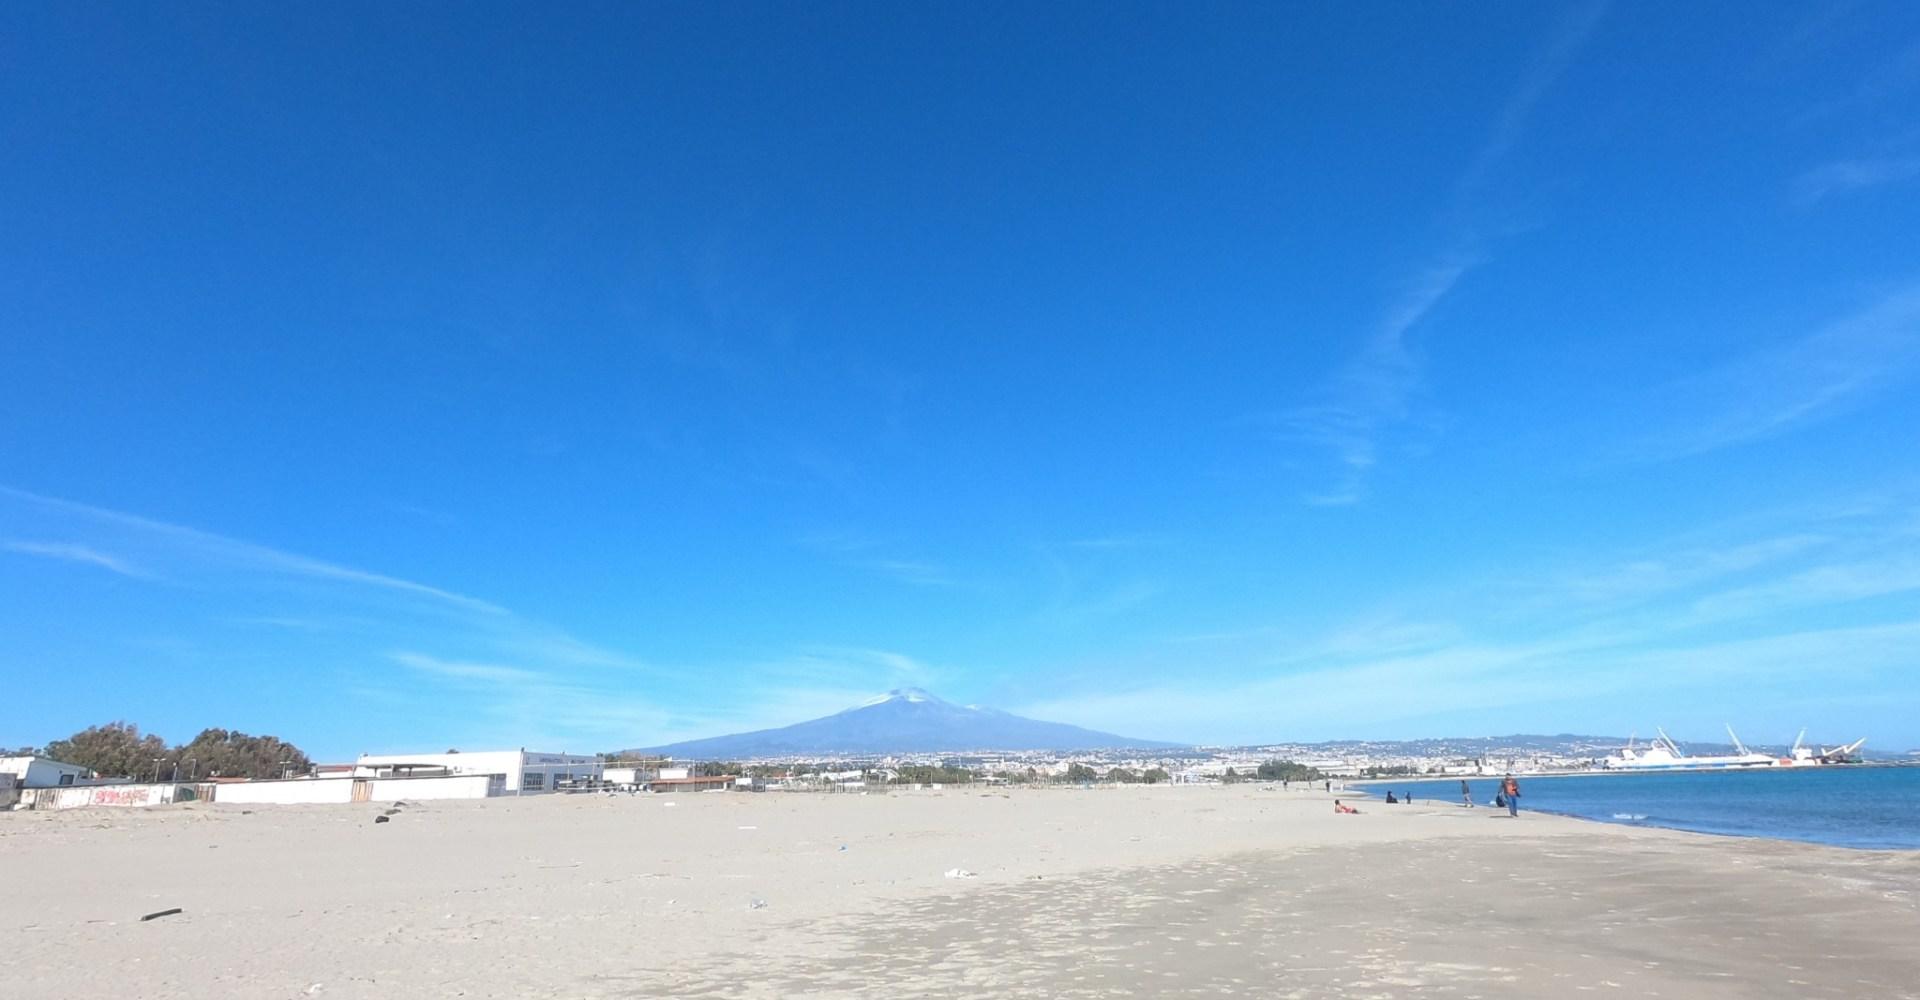 The beaches in Catania – Sicily